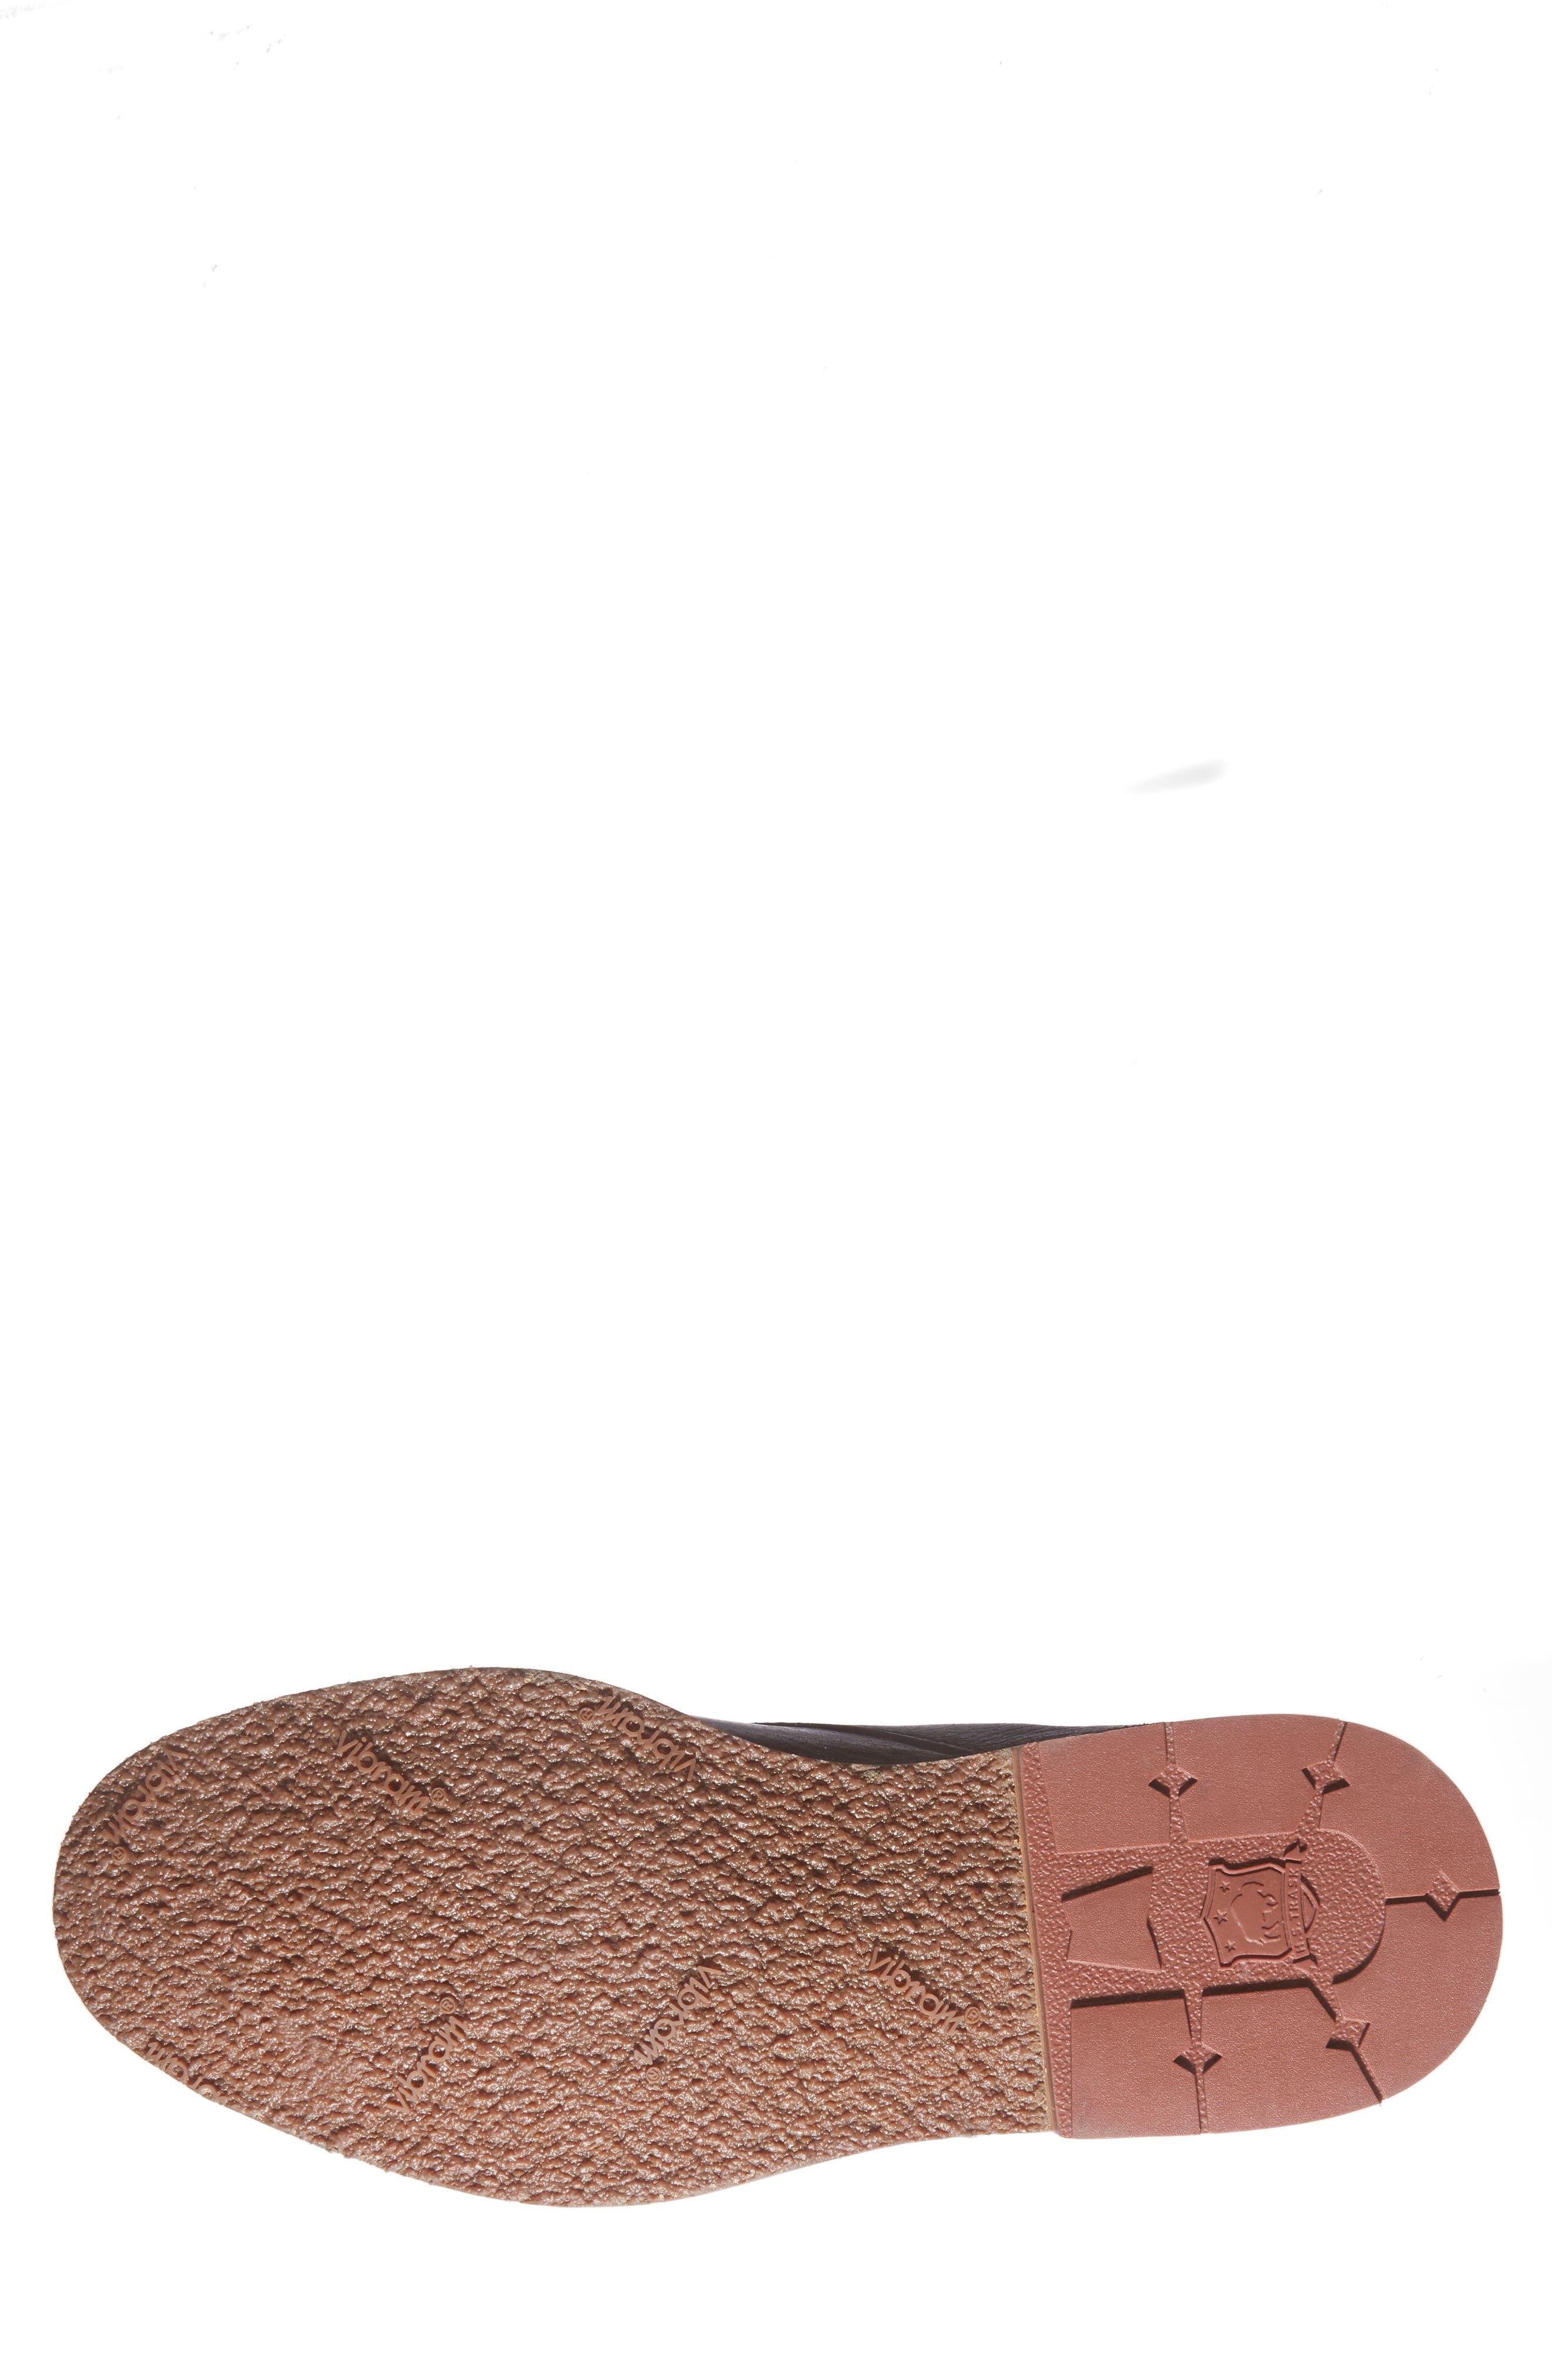 'Brady' Chukka Boot,                             Alternate thumbnail 3, color,                             BLACK NORWEGIAN ELK